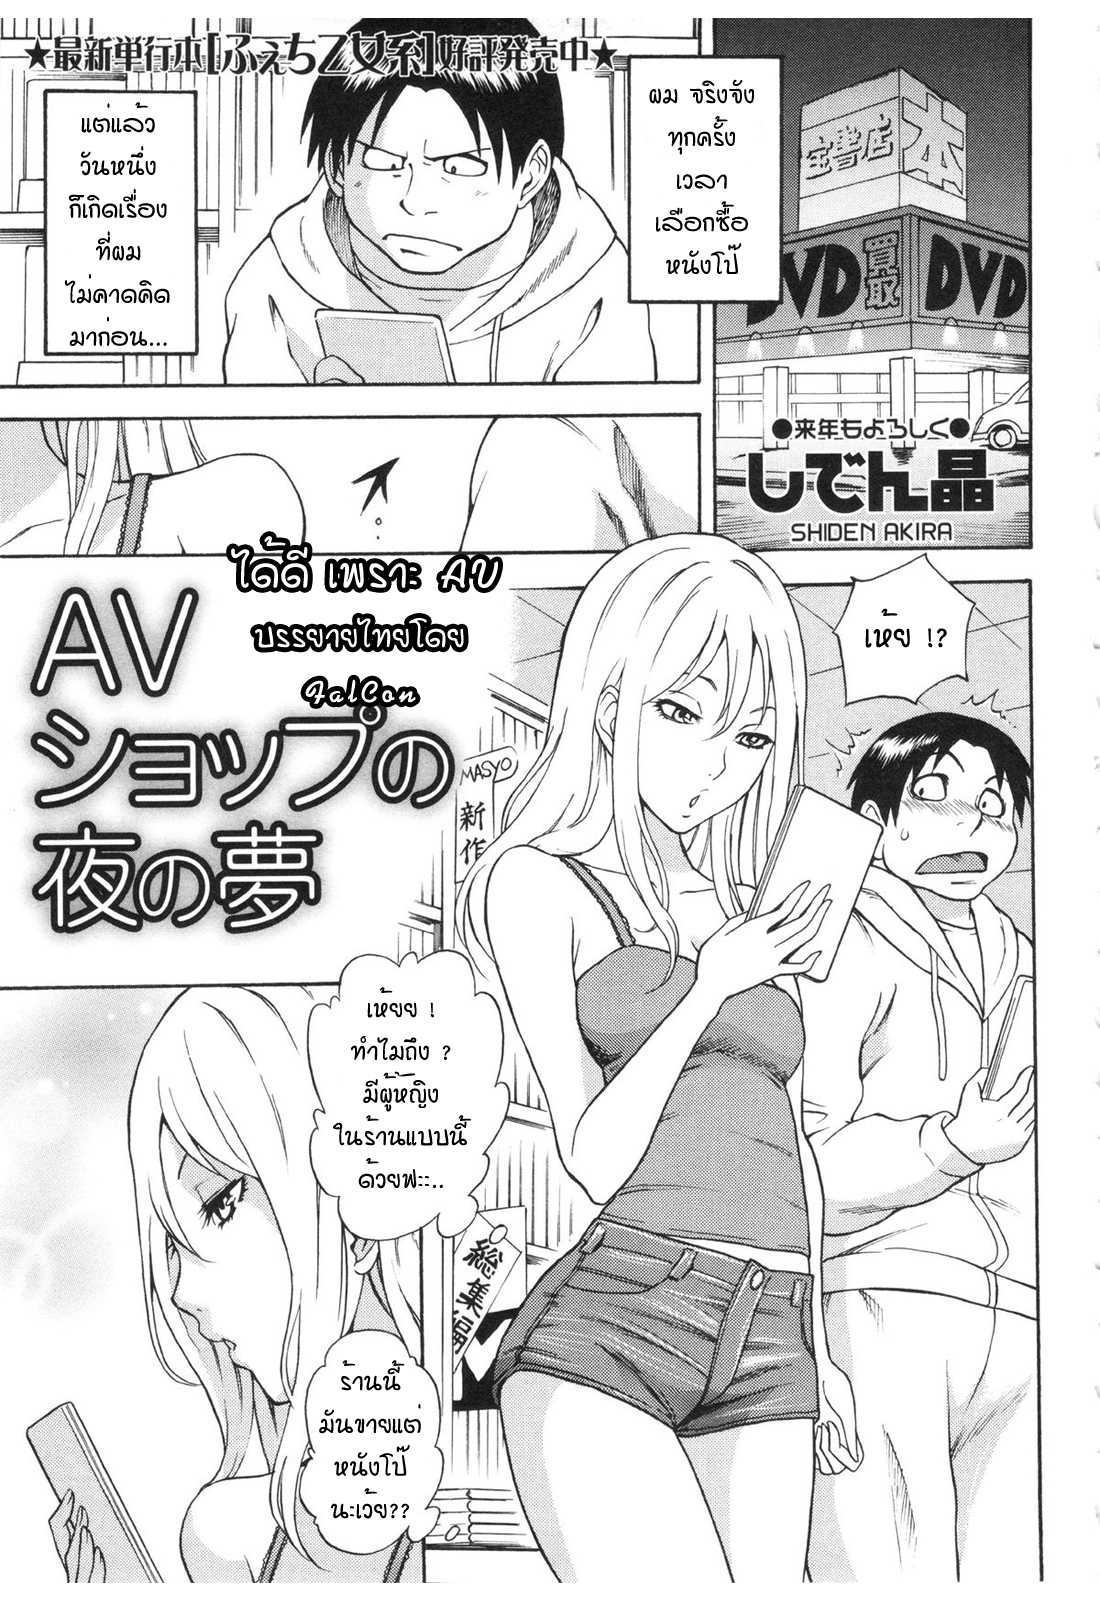 av-shiden-akira-av-shop-no-yoru-no-yume